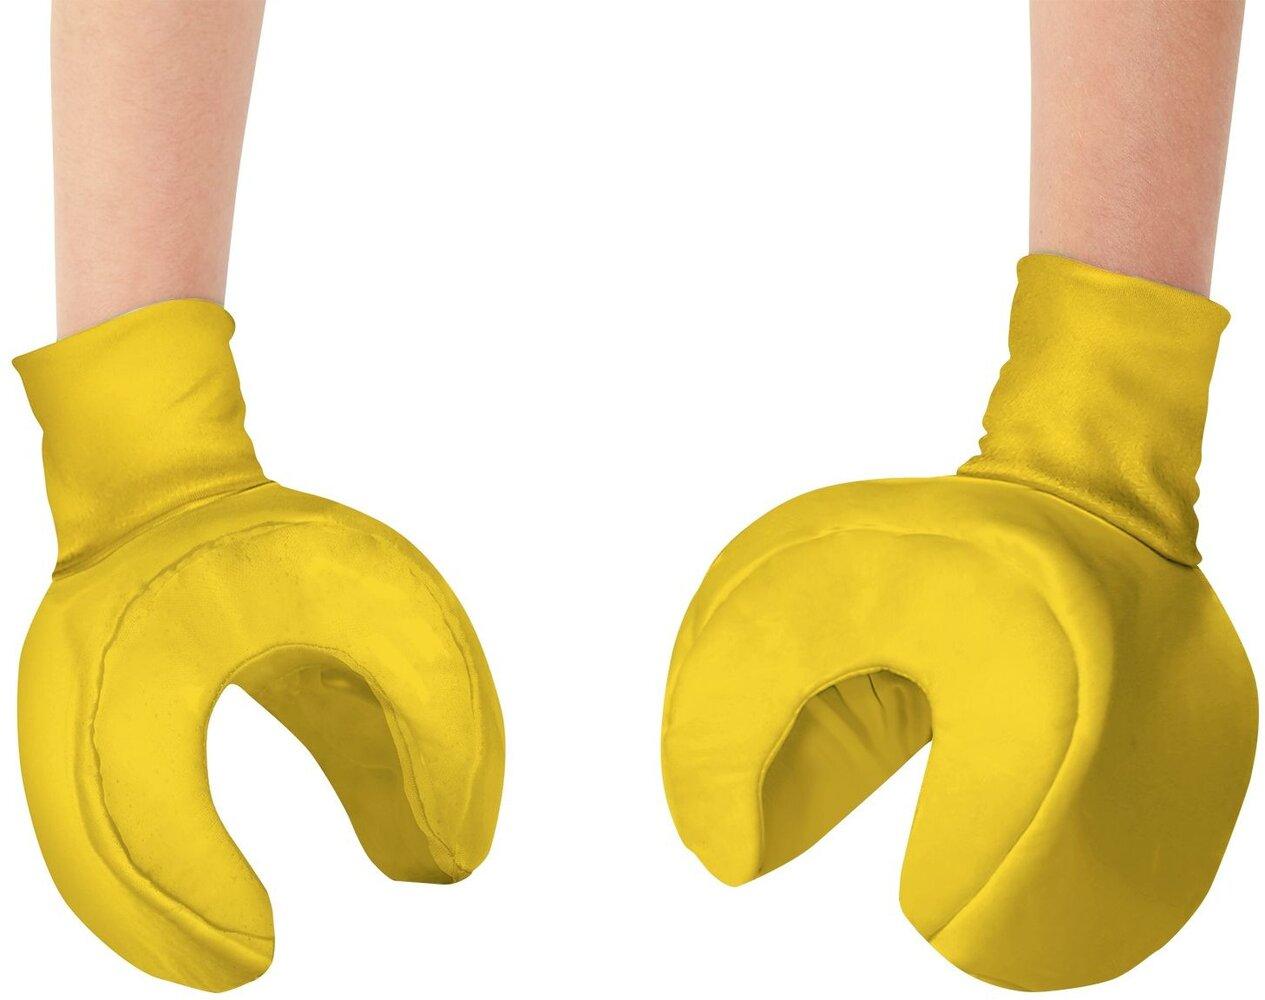 Iconic Yellow Hands